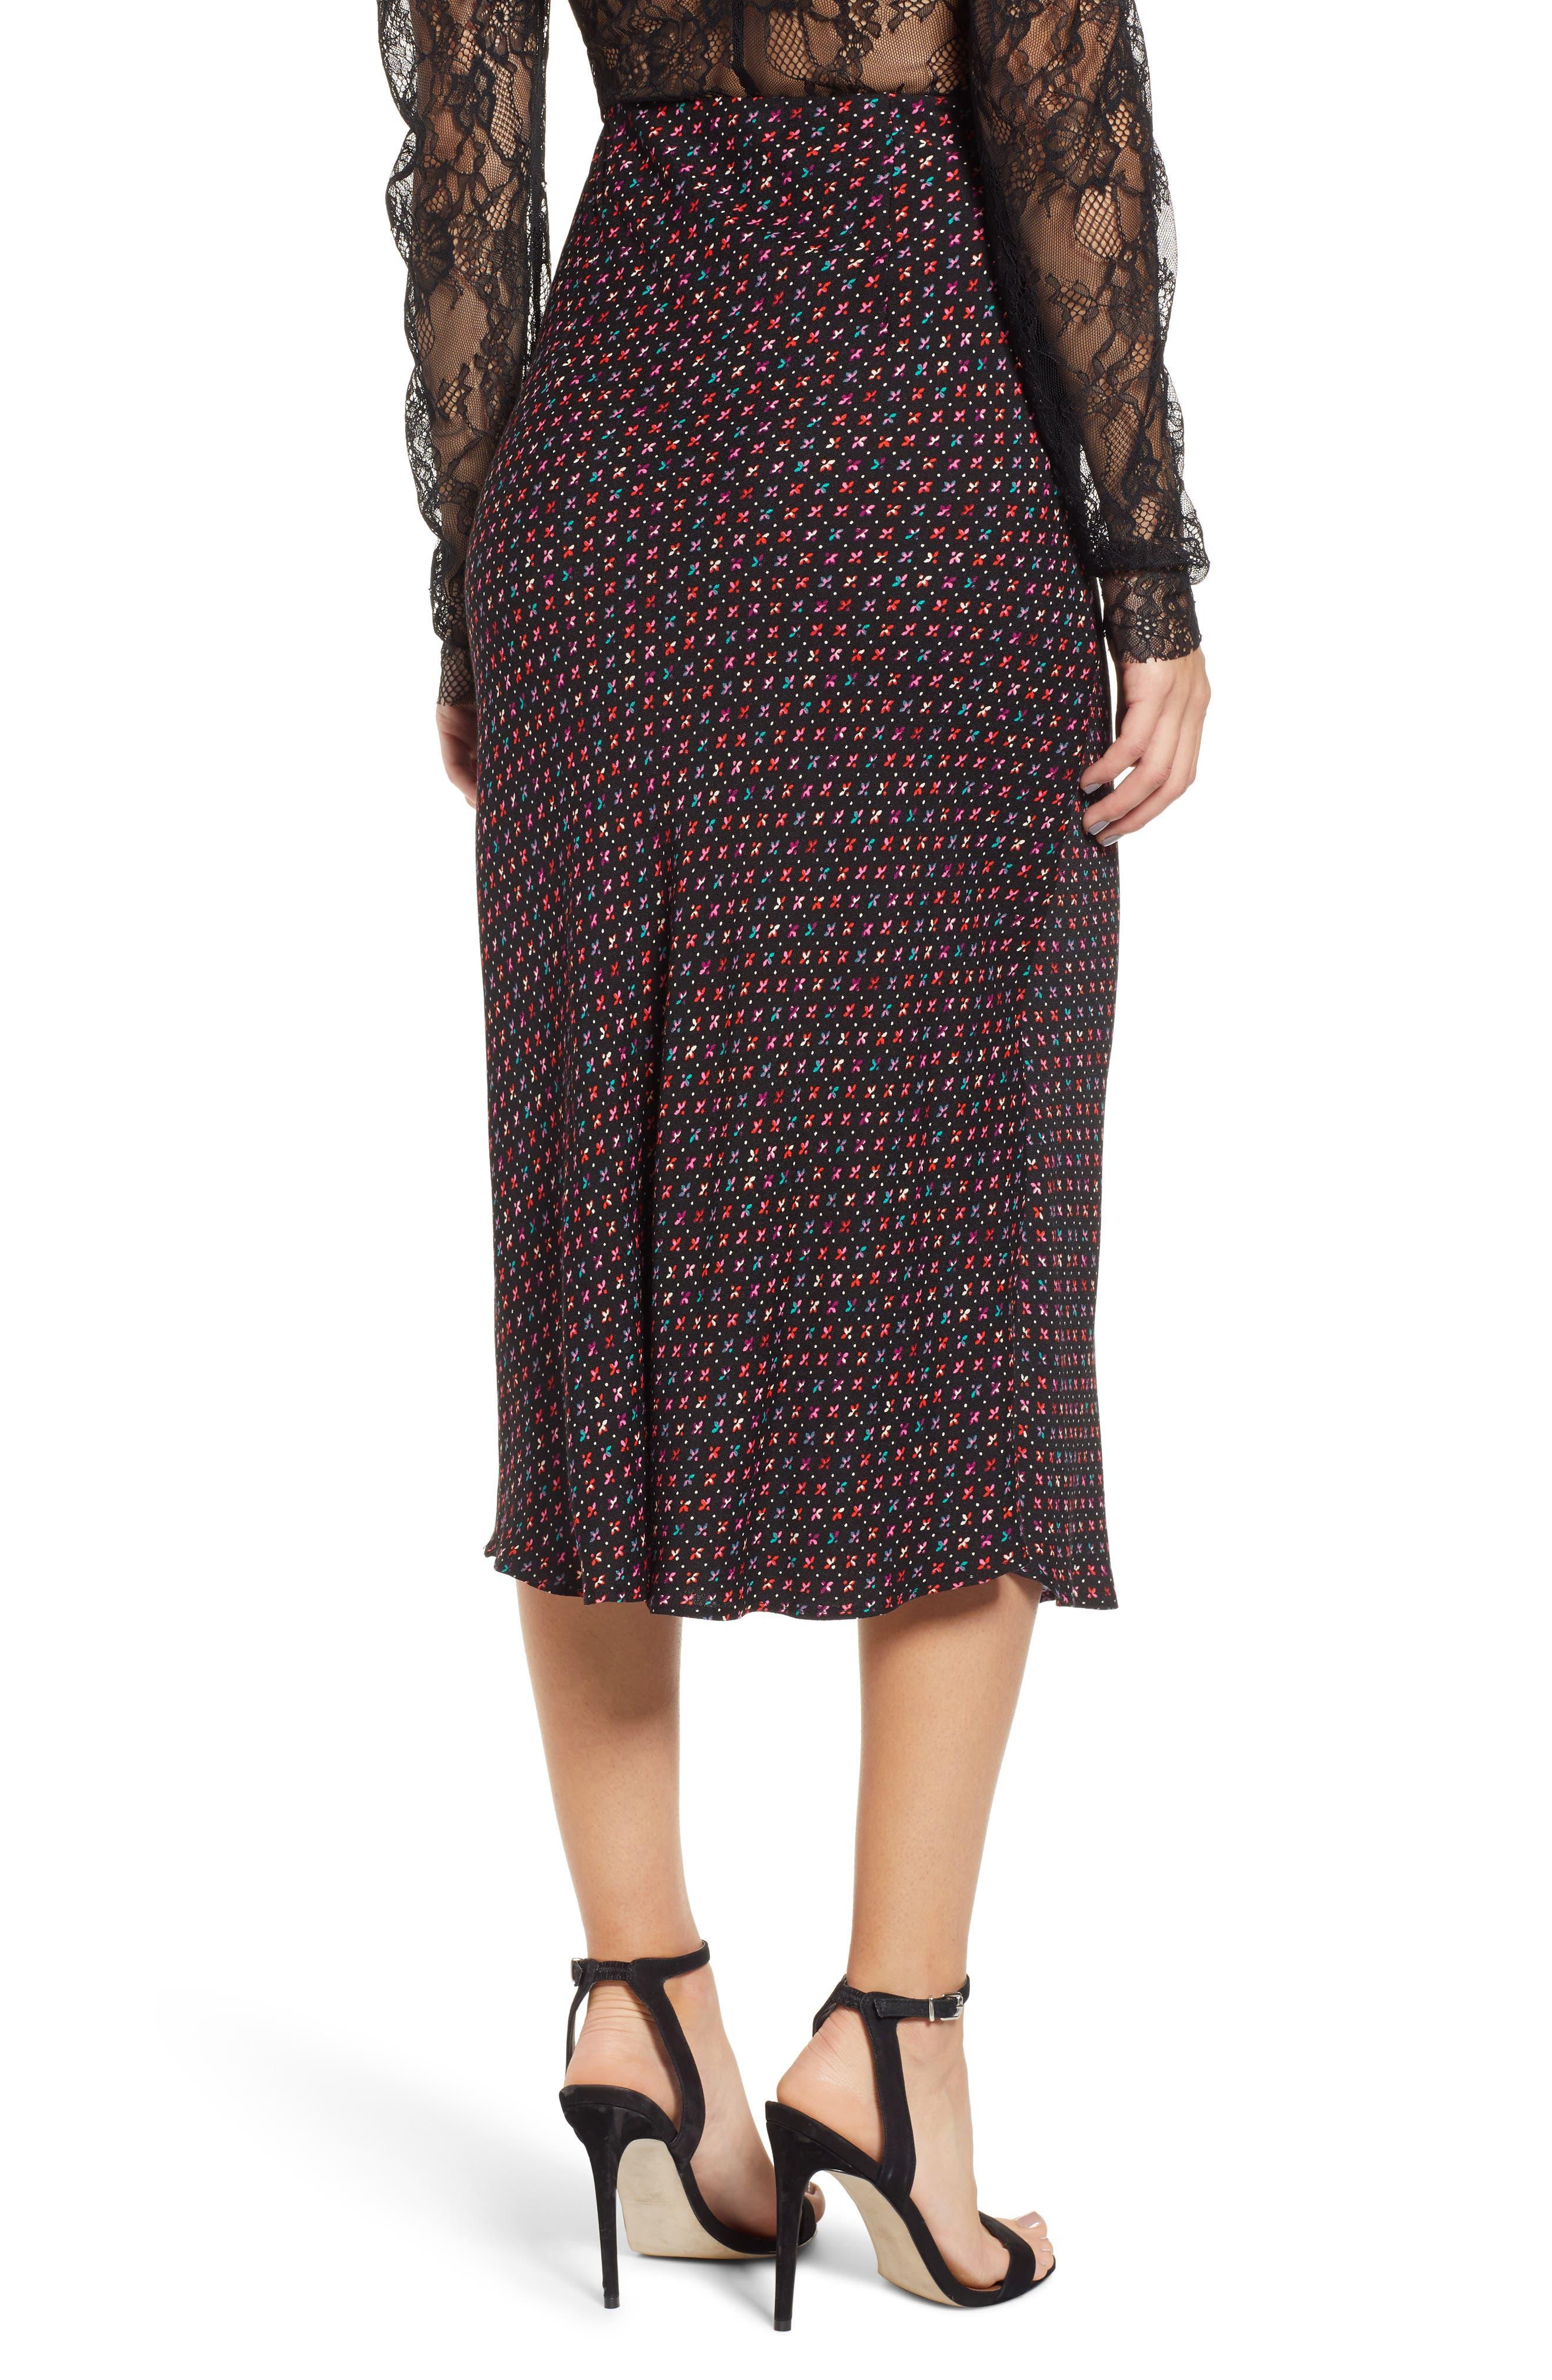 AFRM, Brynne Print Midi Skirt, Alternate thumbnail 2, color, 001